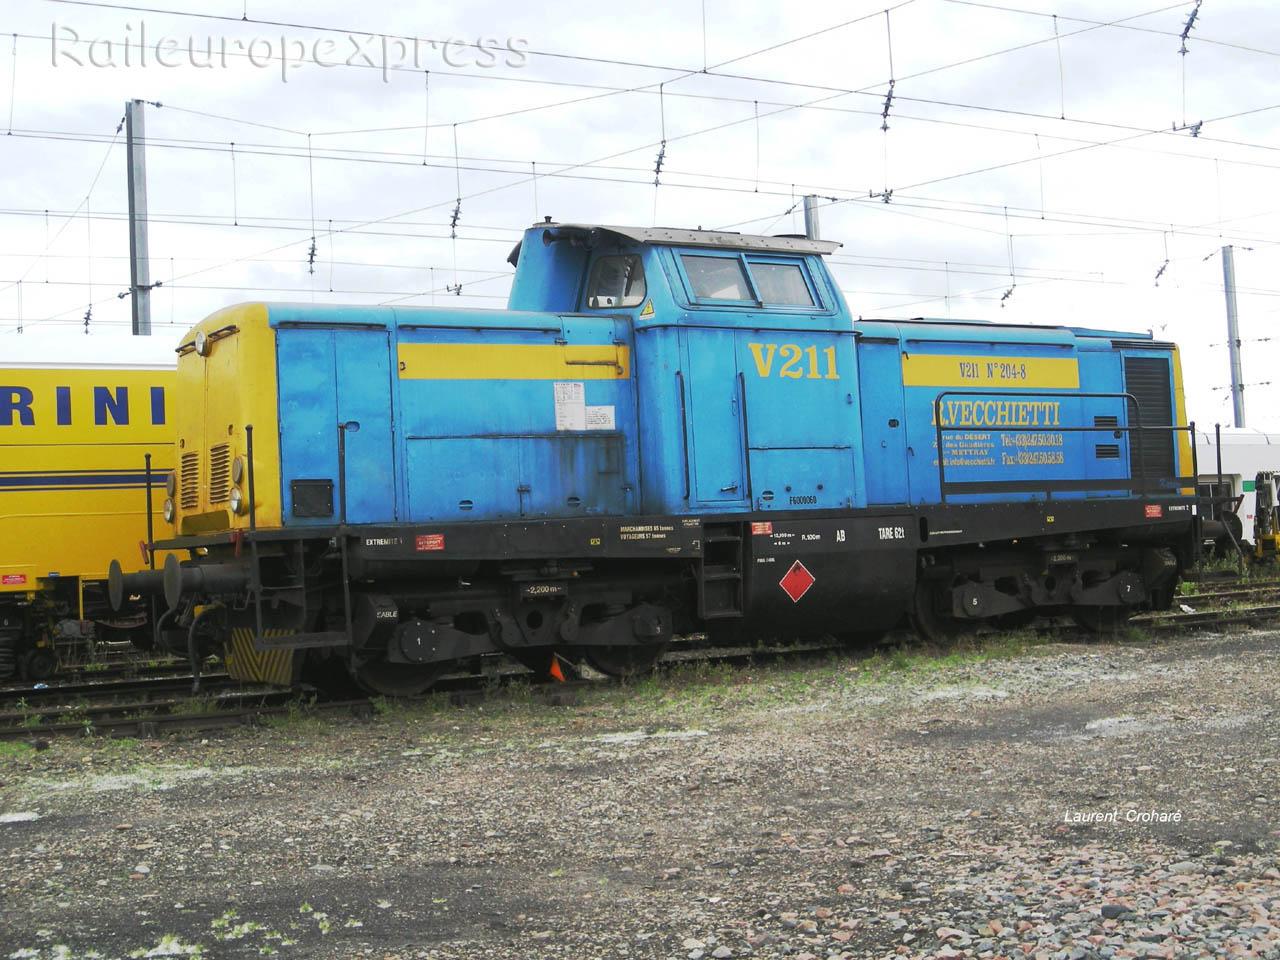 V 211 Vechietti